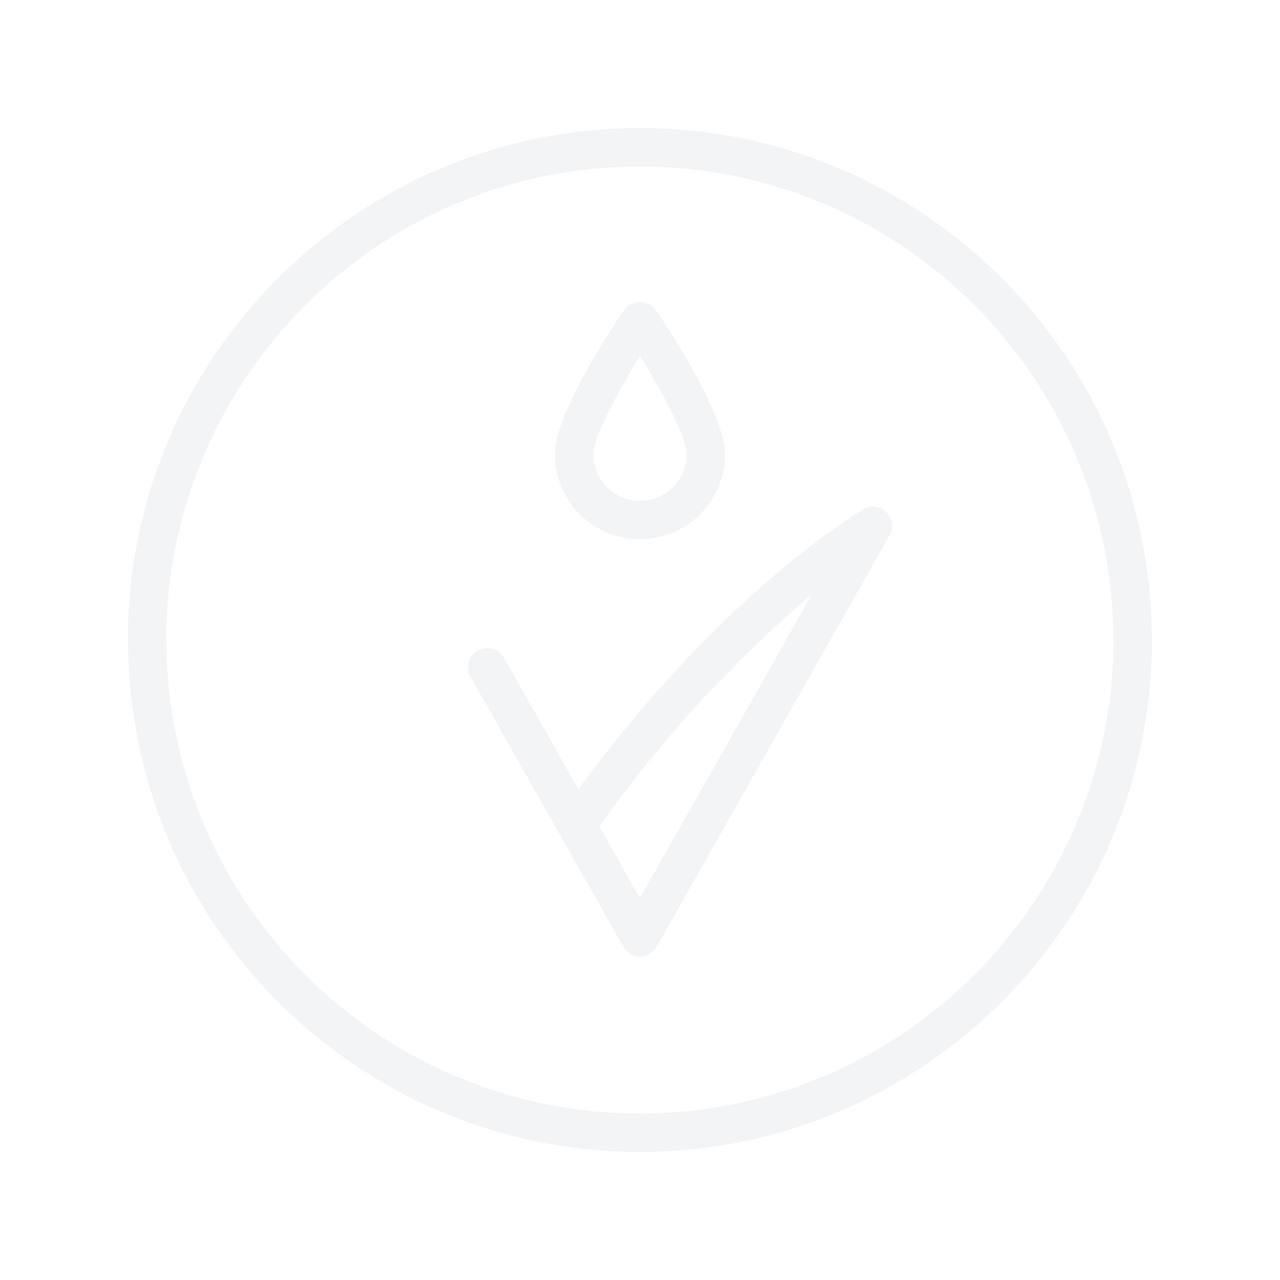 MISSHA Ceramide Capsule Hand Cream 60ml увлажняющий крем для рук с керамидами